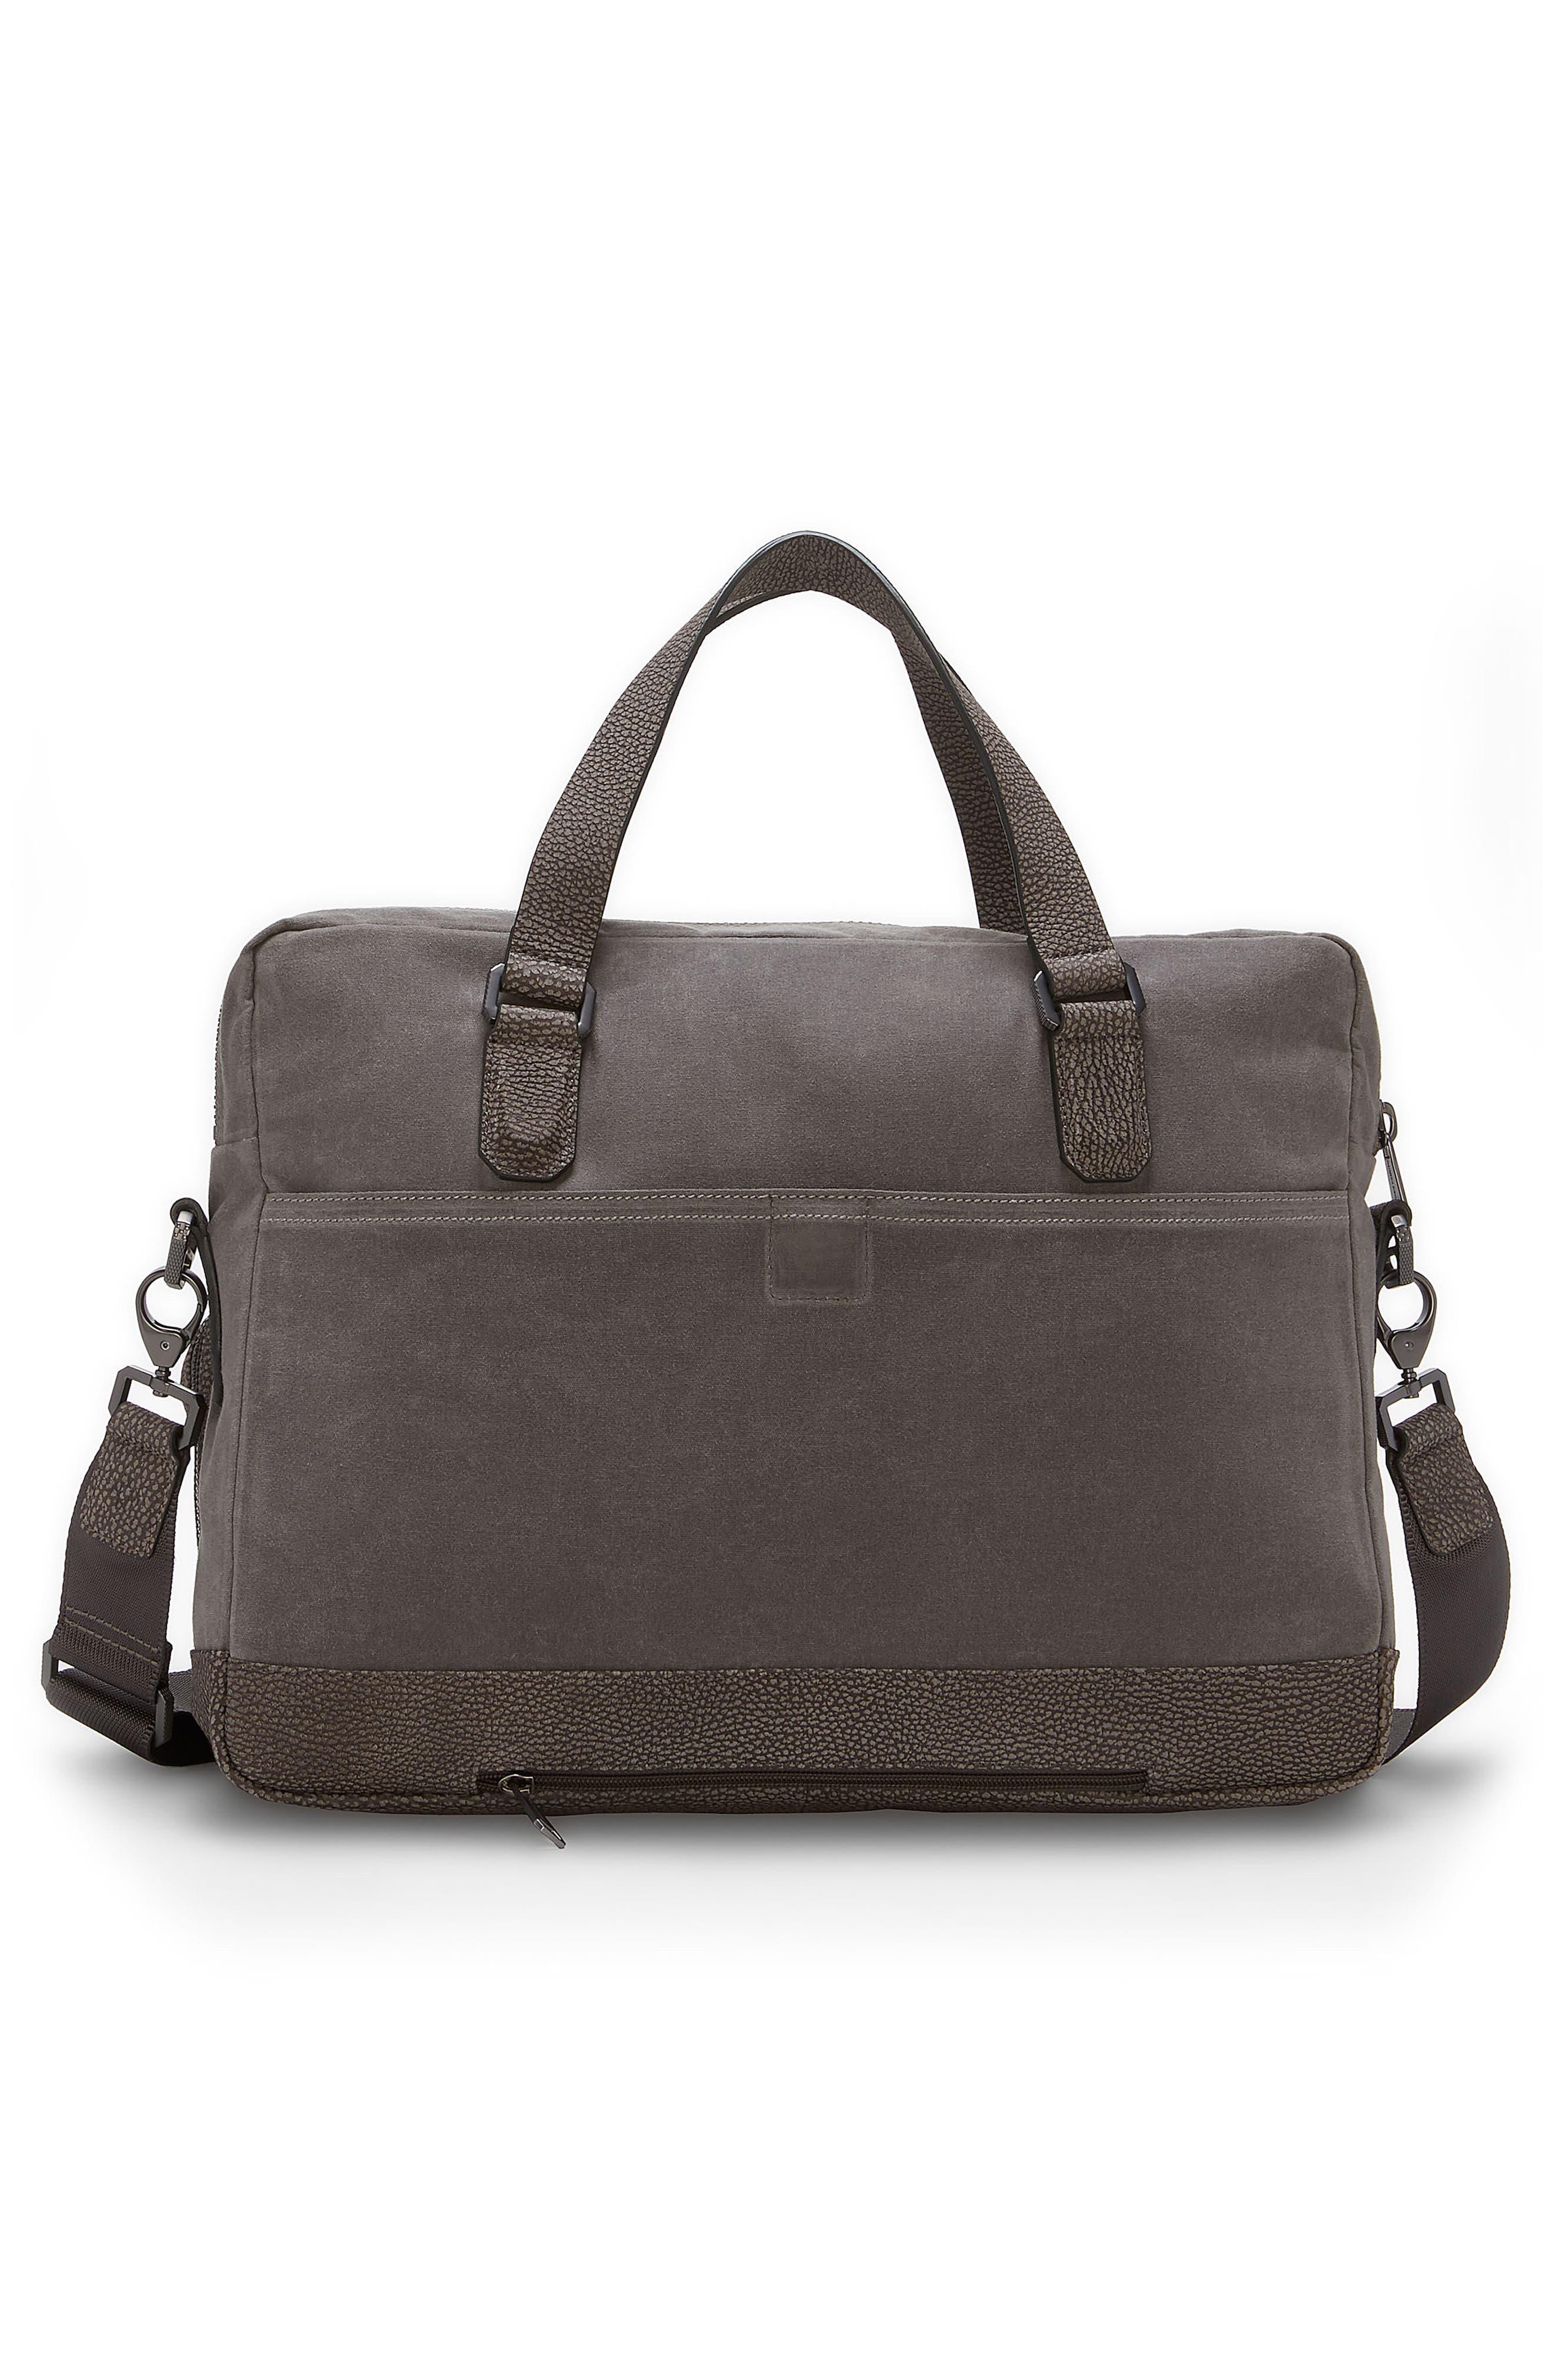 Basin Satchel Briefcase,                             Alternate thumbnail 2, color,                             Steeple Grey